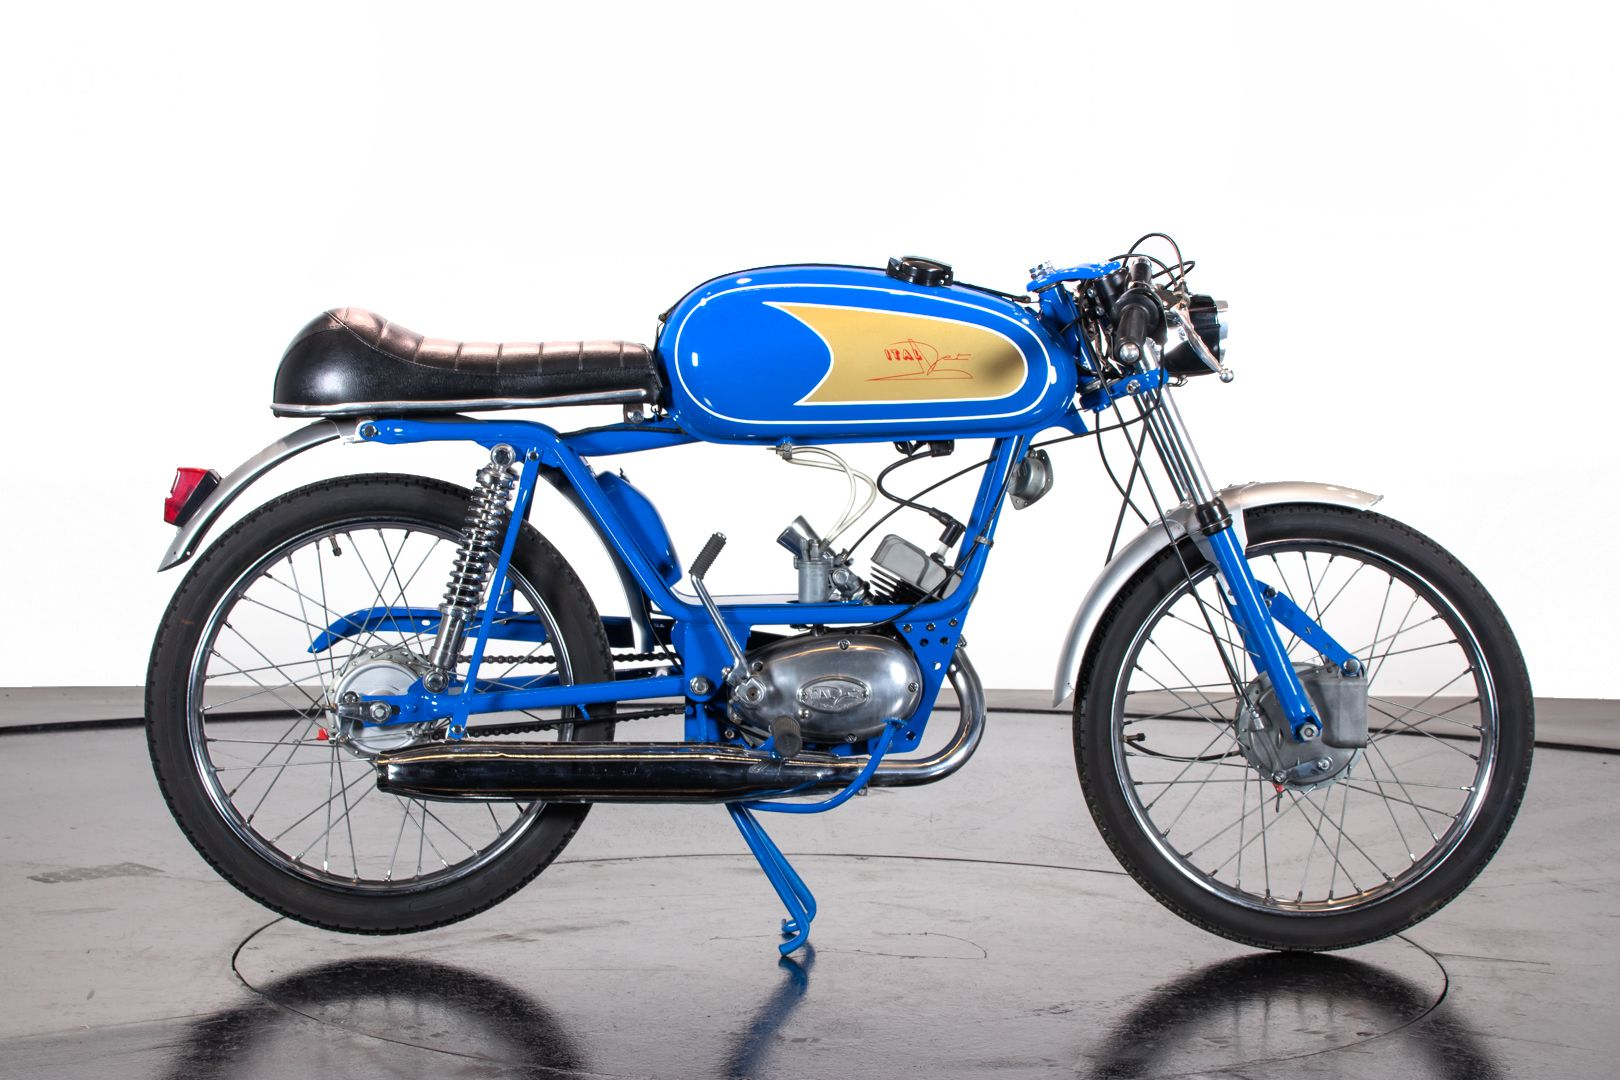 1970 ITALJET 50 58521